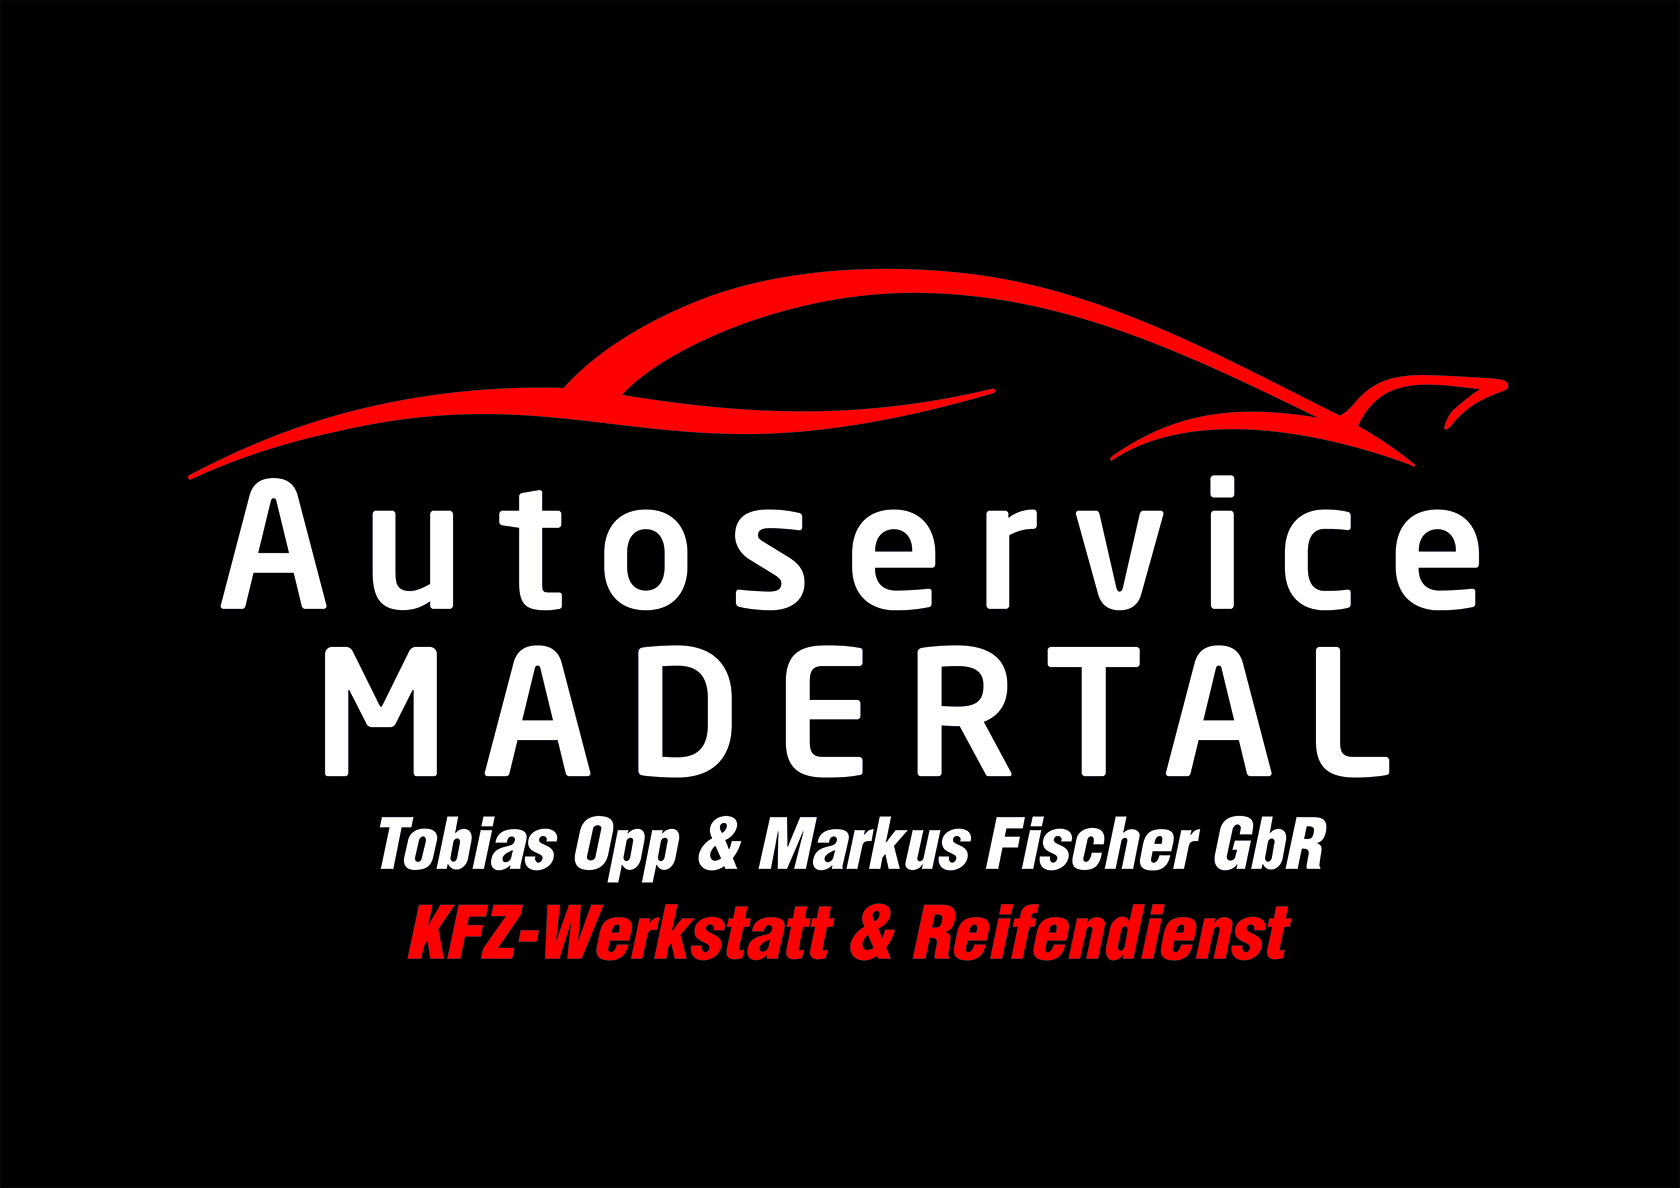 Sponsor Autoservice Madertal